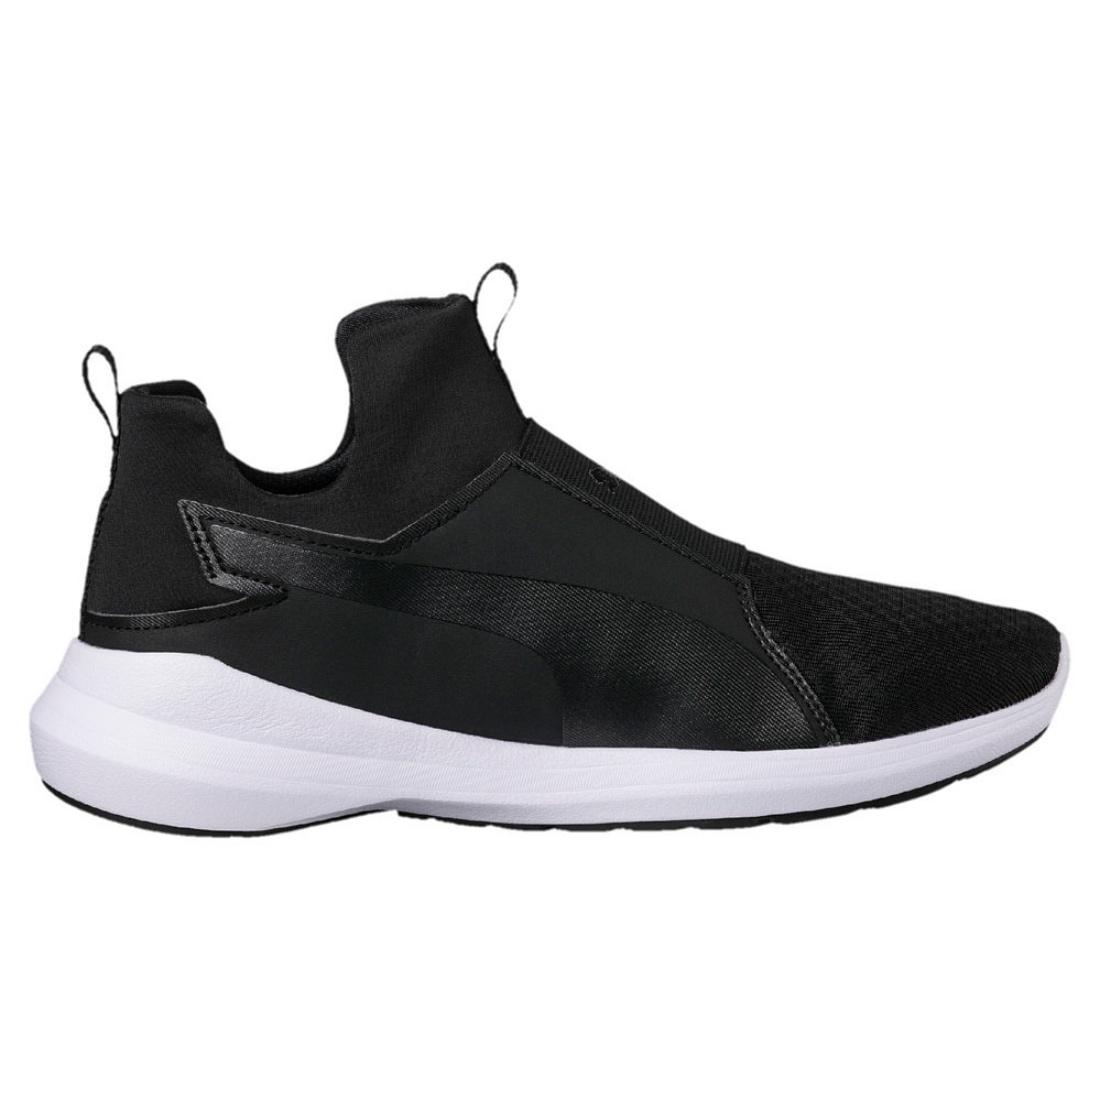 puma rebel mid wns fitnessschuh damen sneaker 364539 schuhe damen sneaker sportschuhe. Black Bedroom Furniture Sets. Home Design Ideas